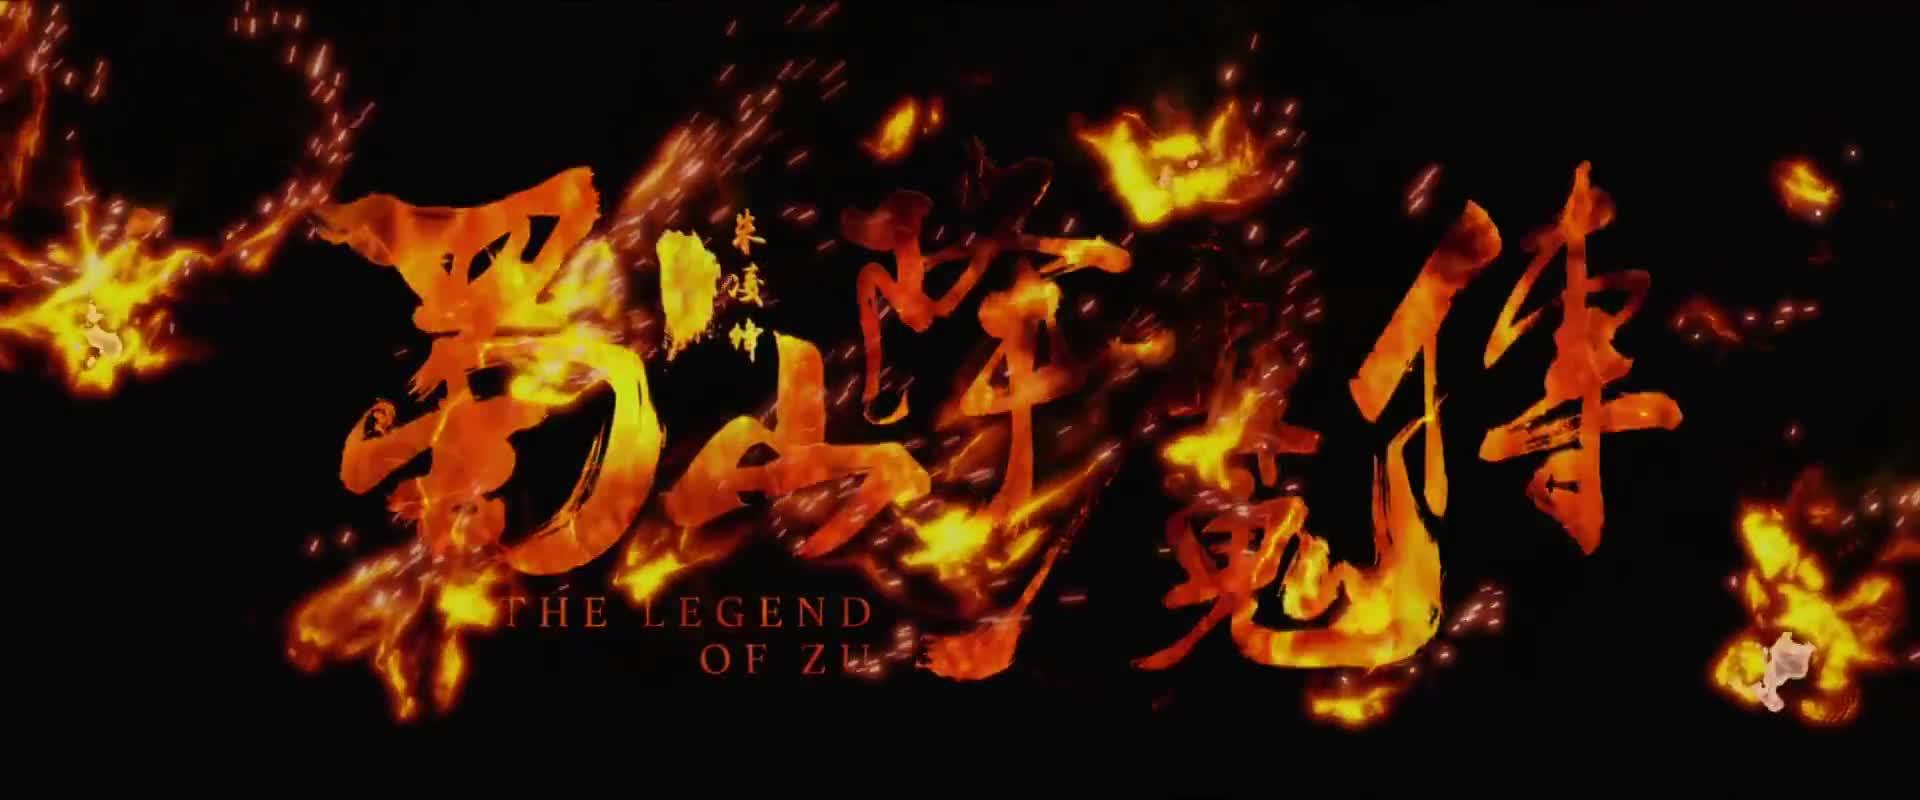 The Legend of Zu ตำนานสงครามล้างพิภพ (2018)